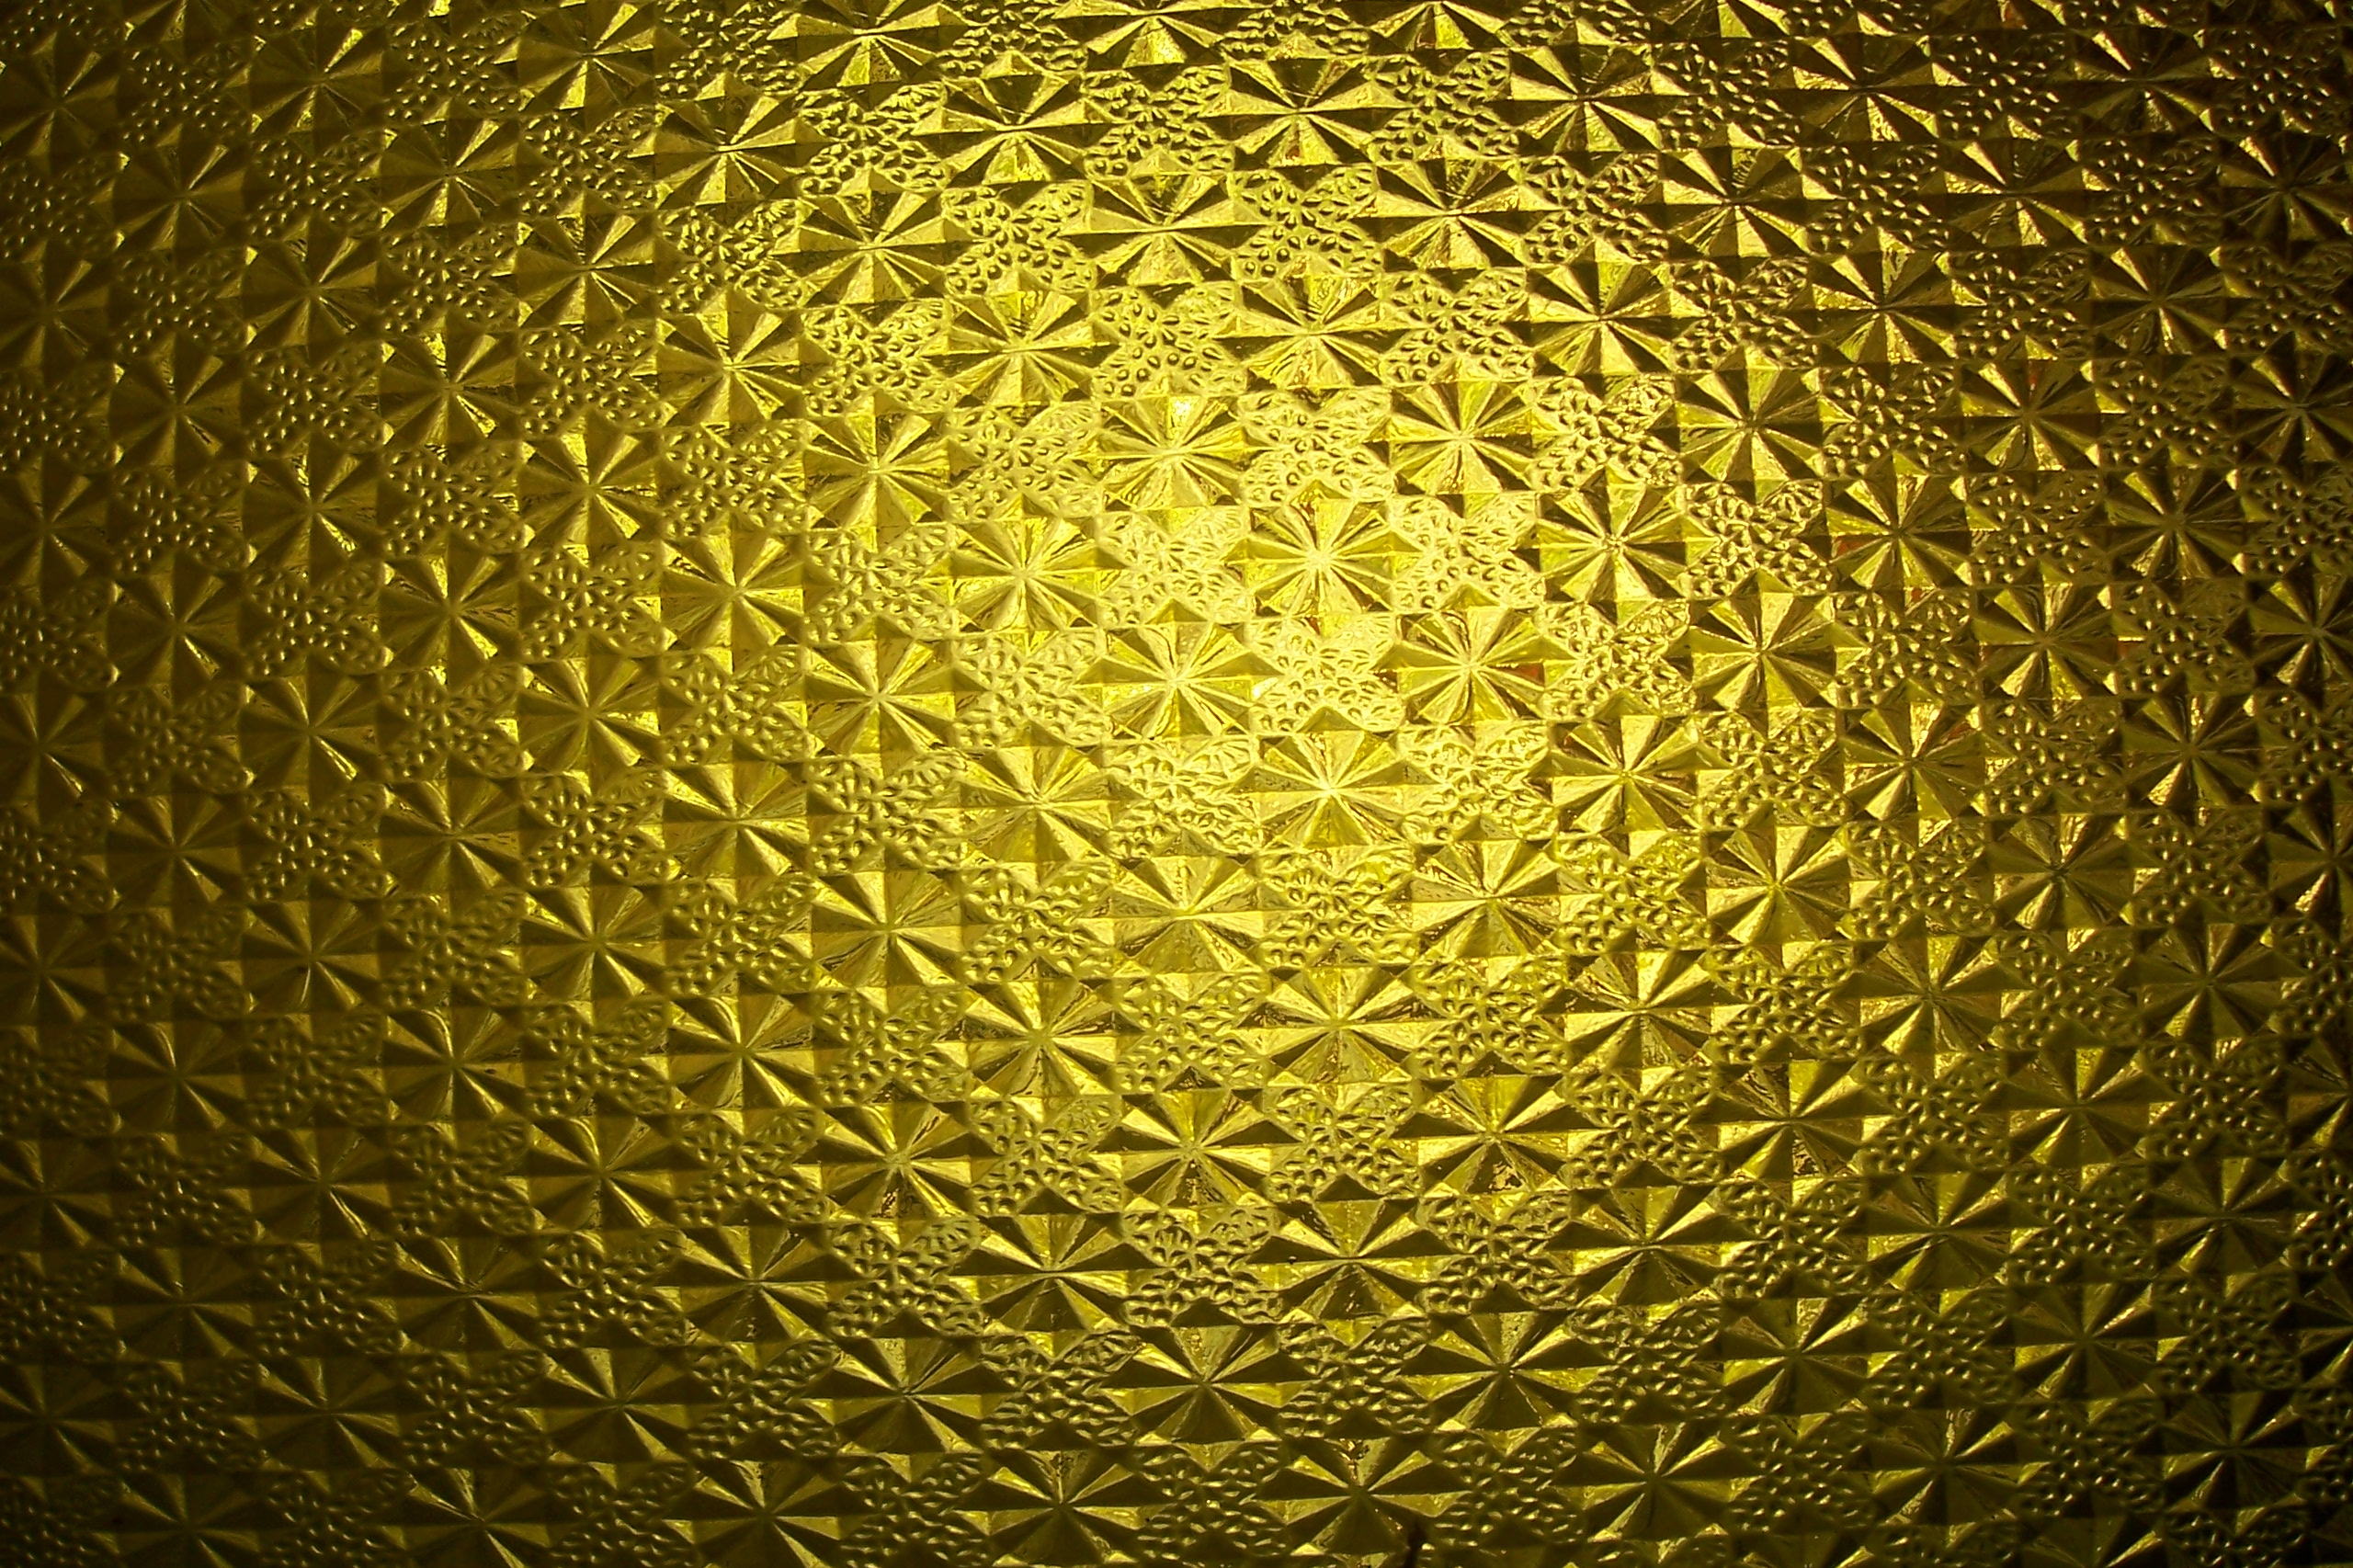 Dark Textures clipart golden texture Gold In Patterns Textures